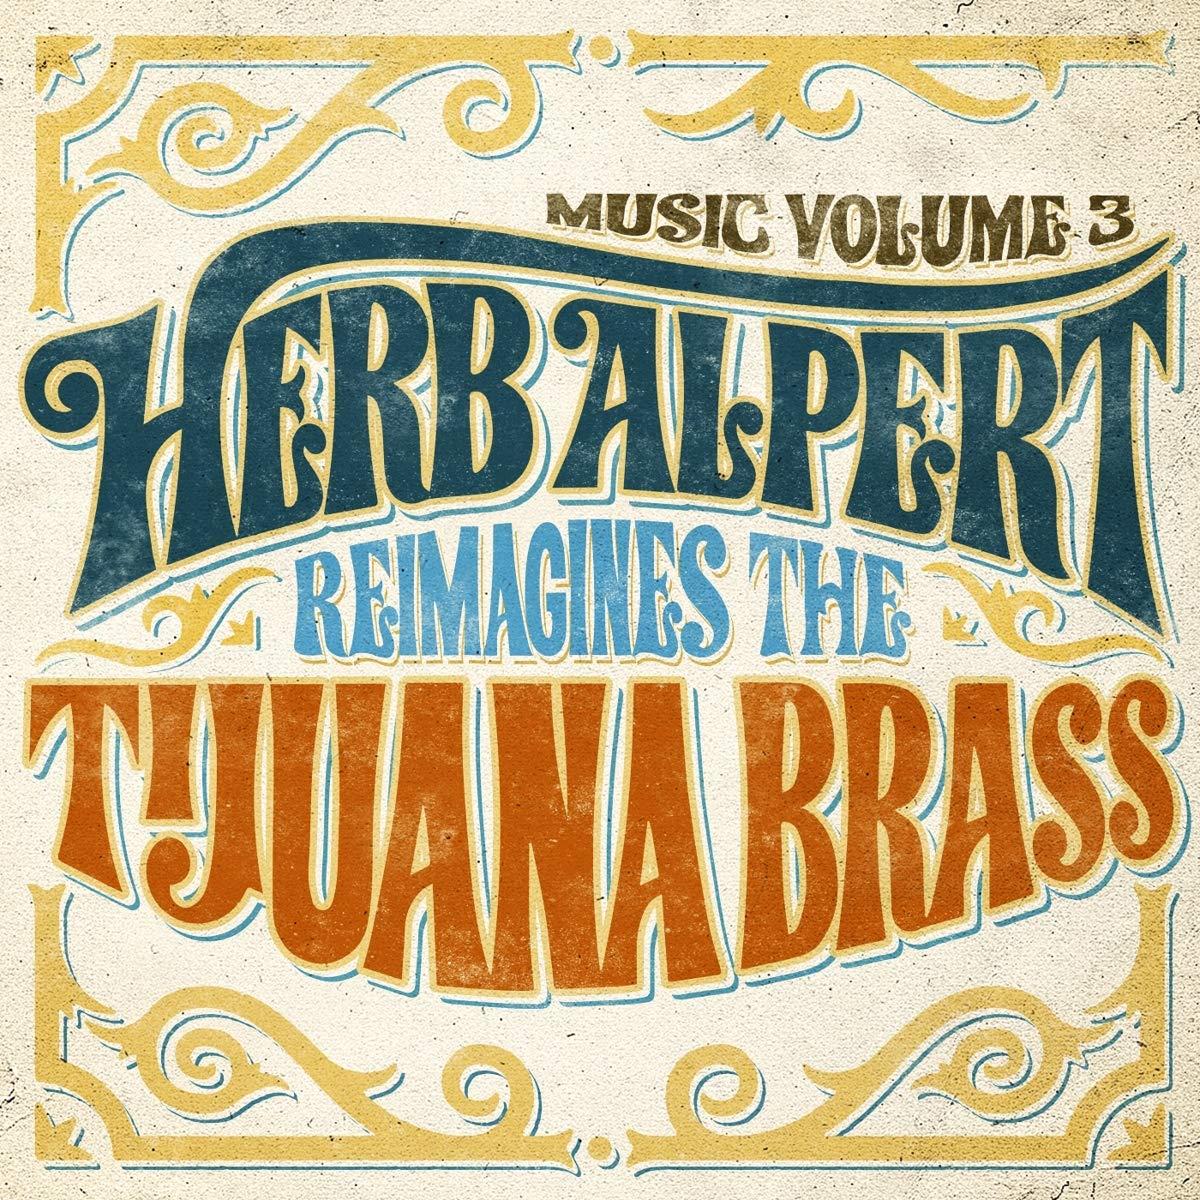 Book Cover: Music Volume 3 - Herb Alpert Reimagines The Tijuana Brass